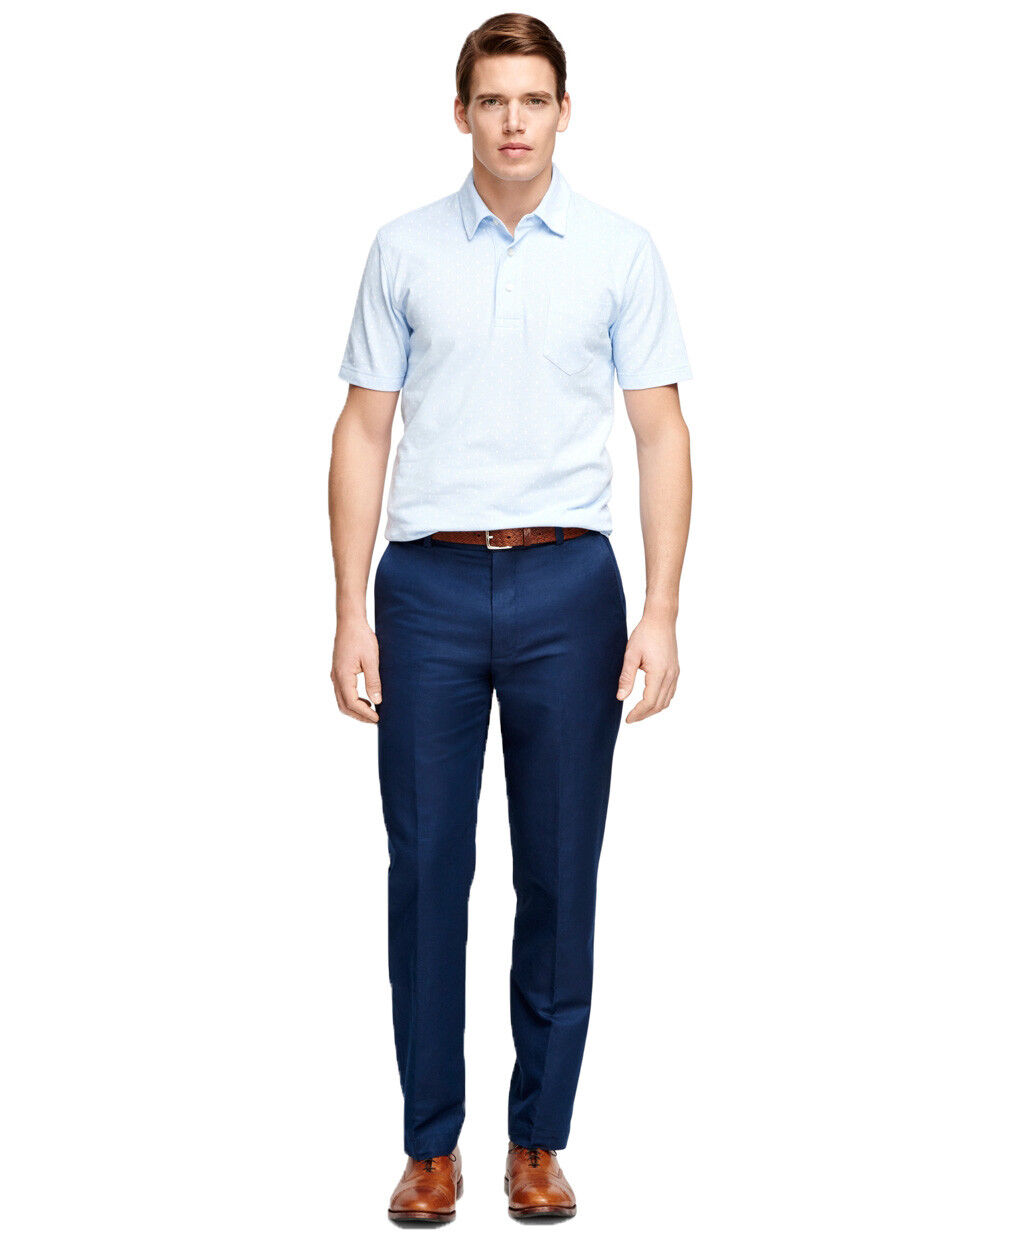 Brooks Bredhers Mens Clark Garment-Dyed Cotton Pant, bluee (32 34) 5319-4